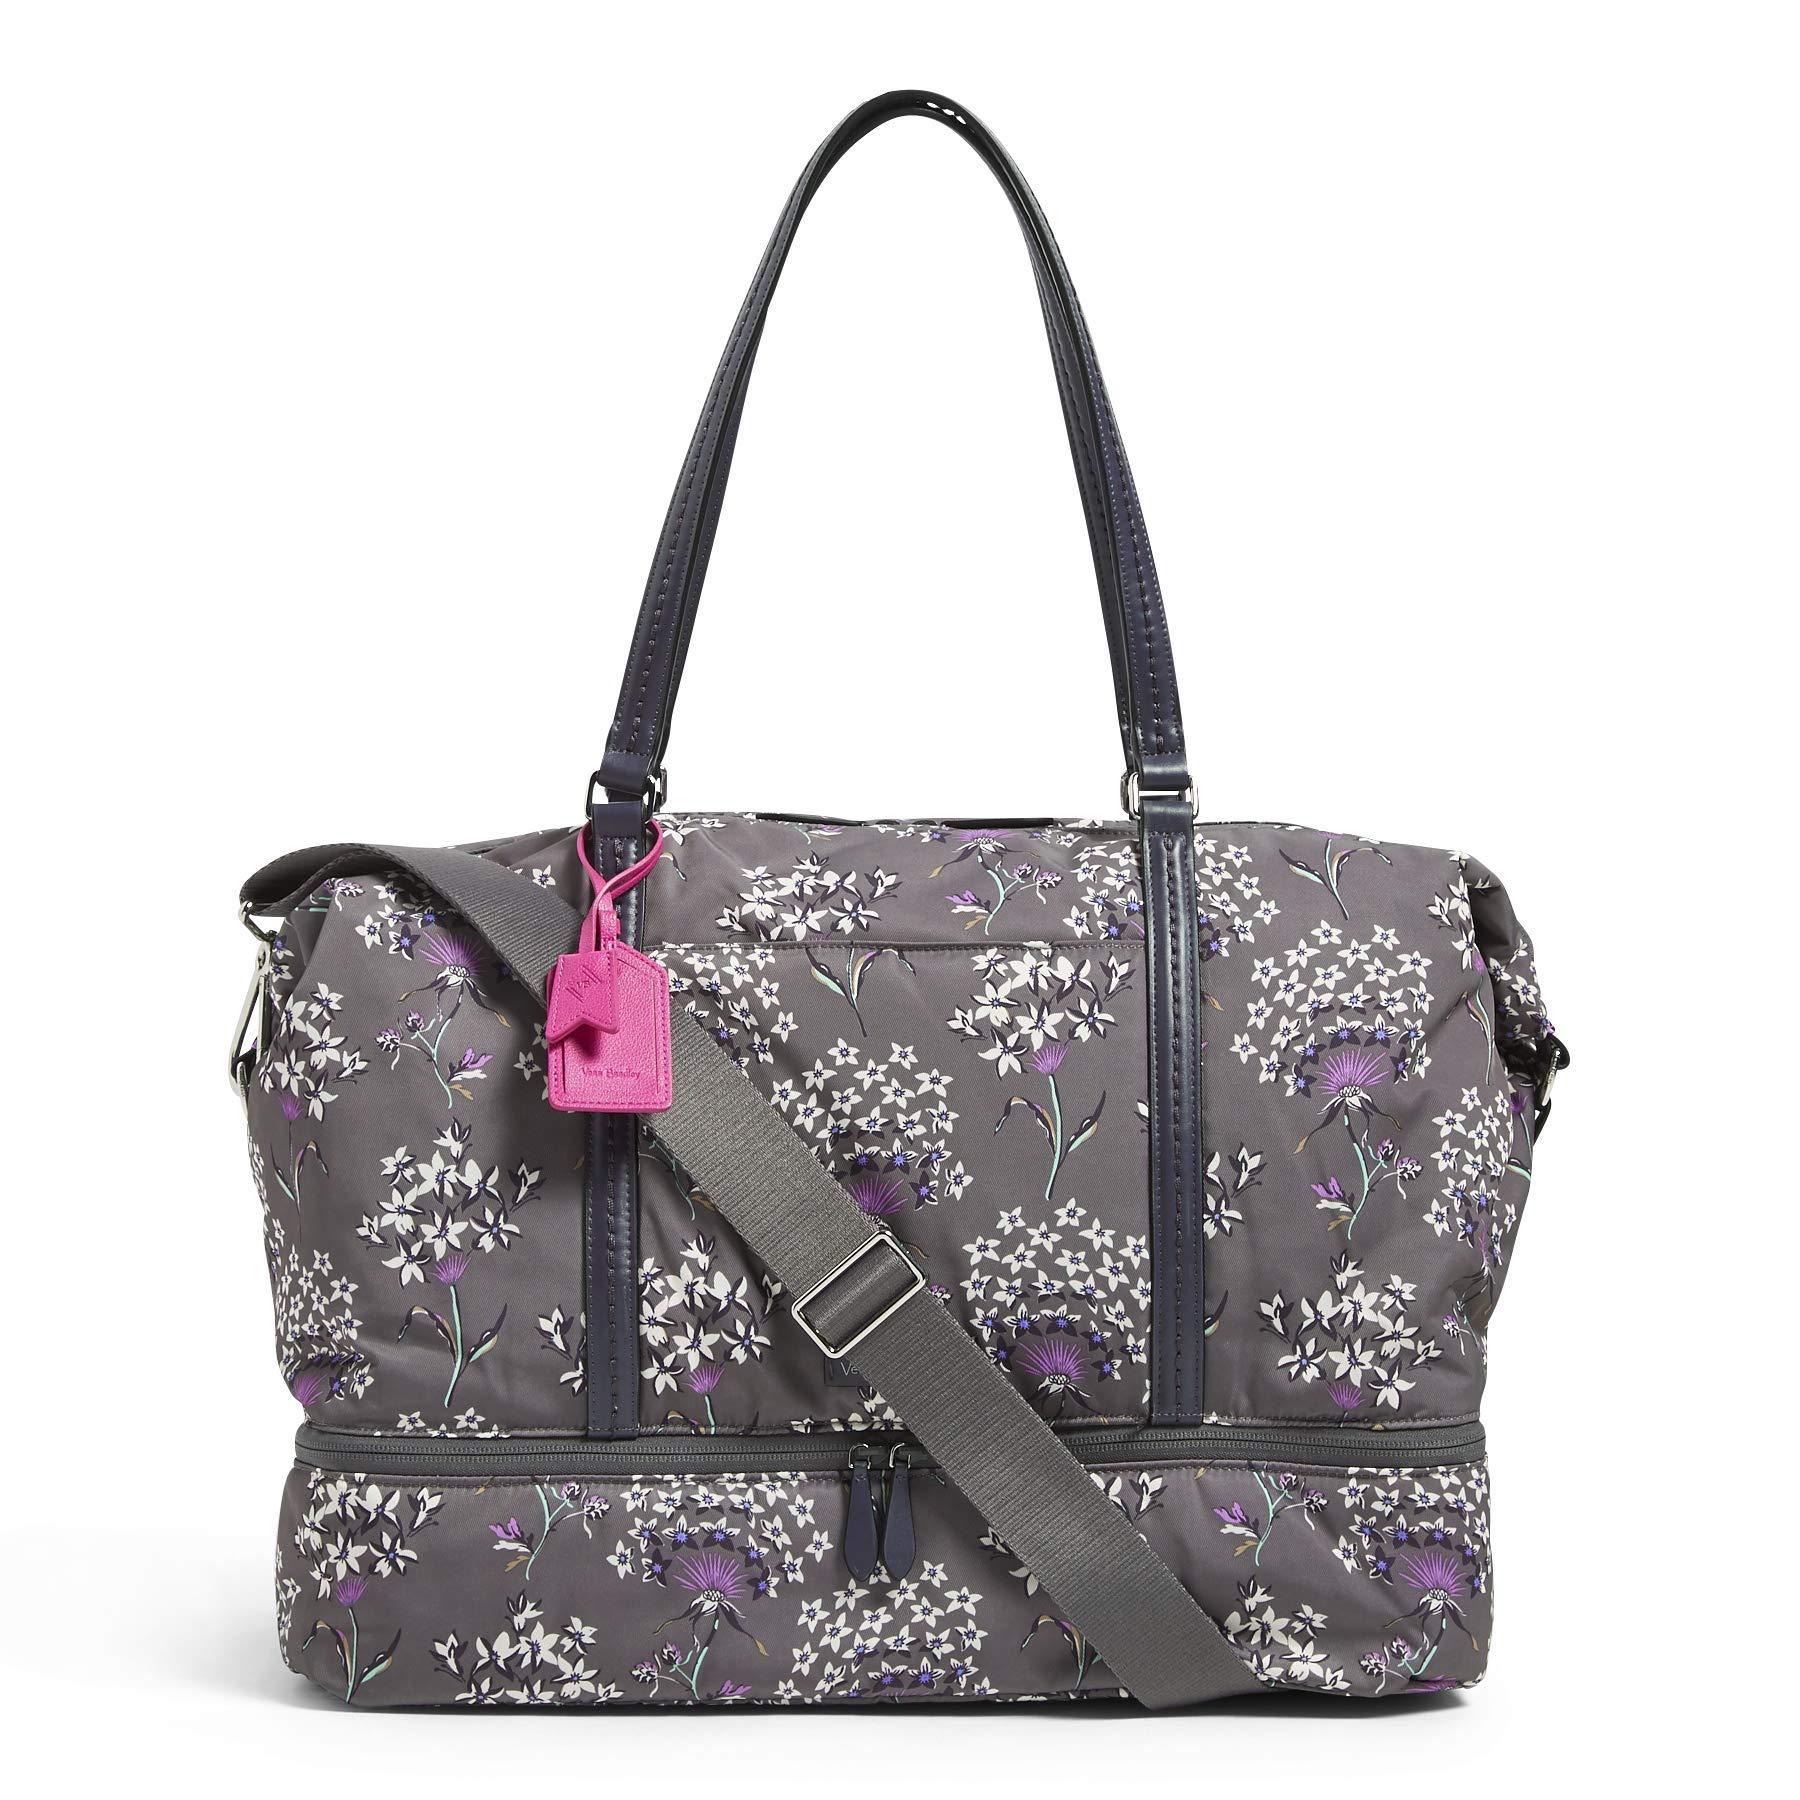 Vera Bradley Midtown Travel Bag, Dandelion Wishes